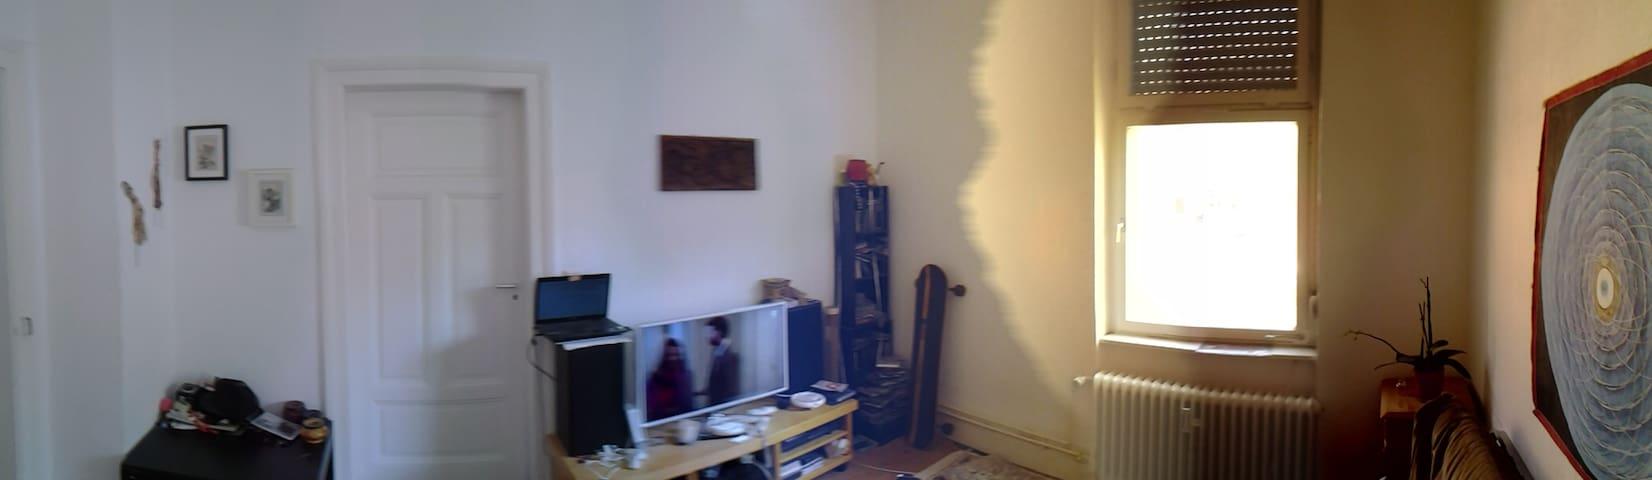 altbau im hinterhof - Freiburg im Breisgau - Apartment